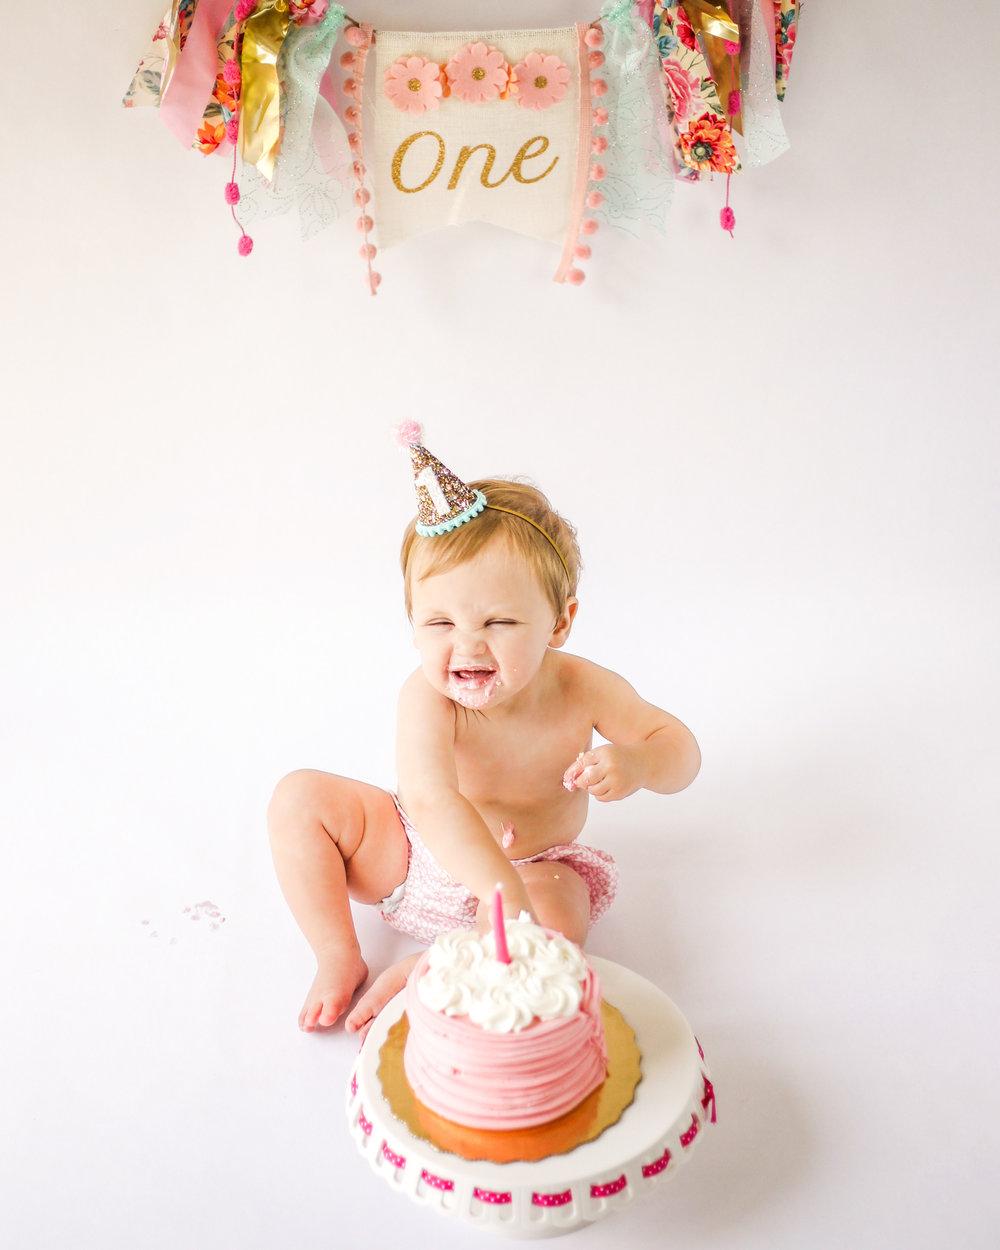 Atlanta Cake Smash Photographer